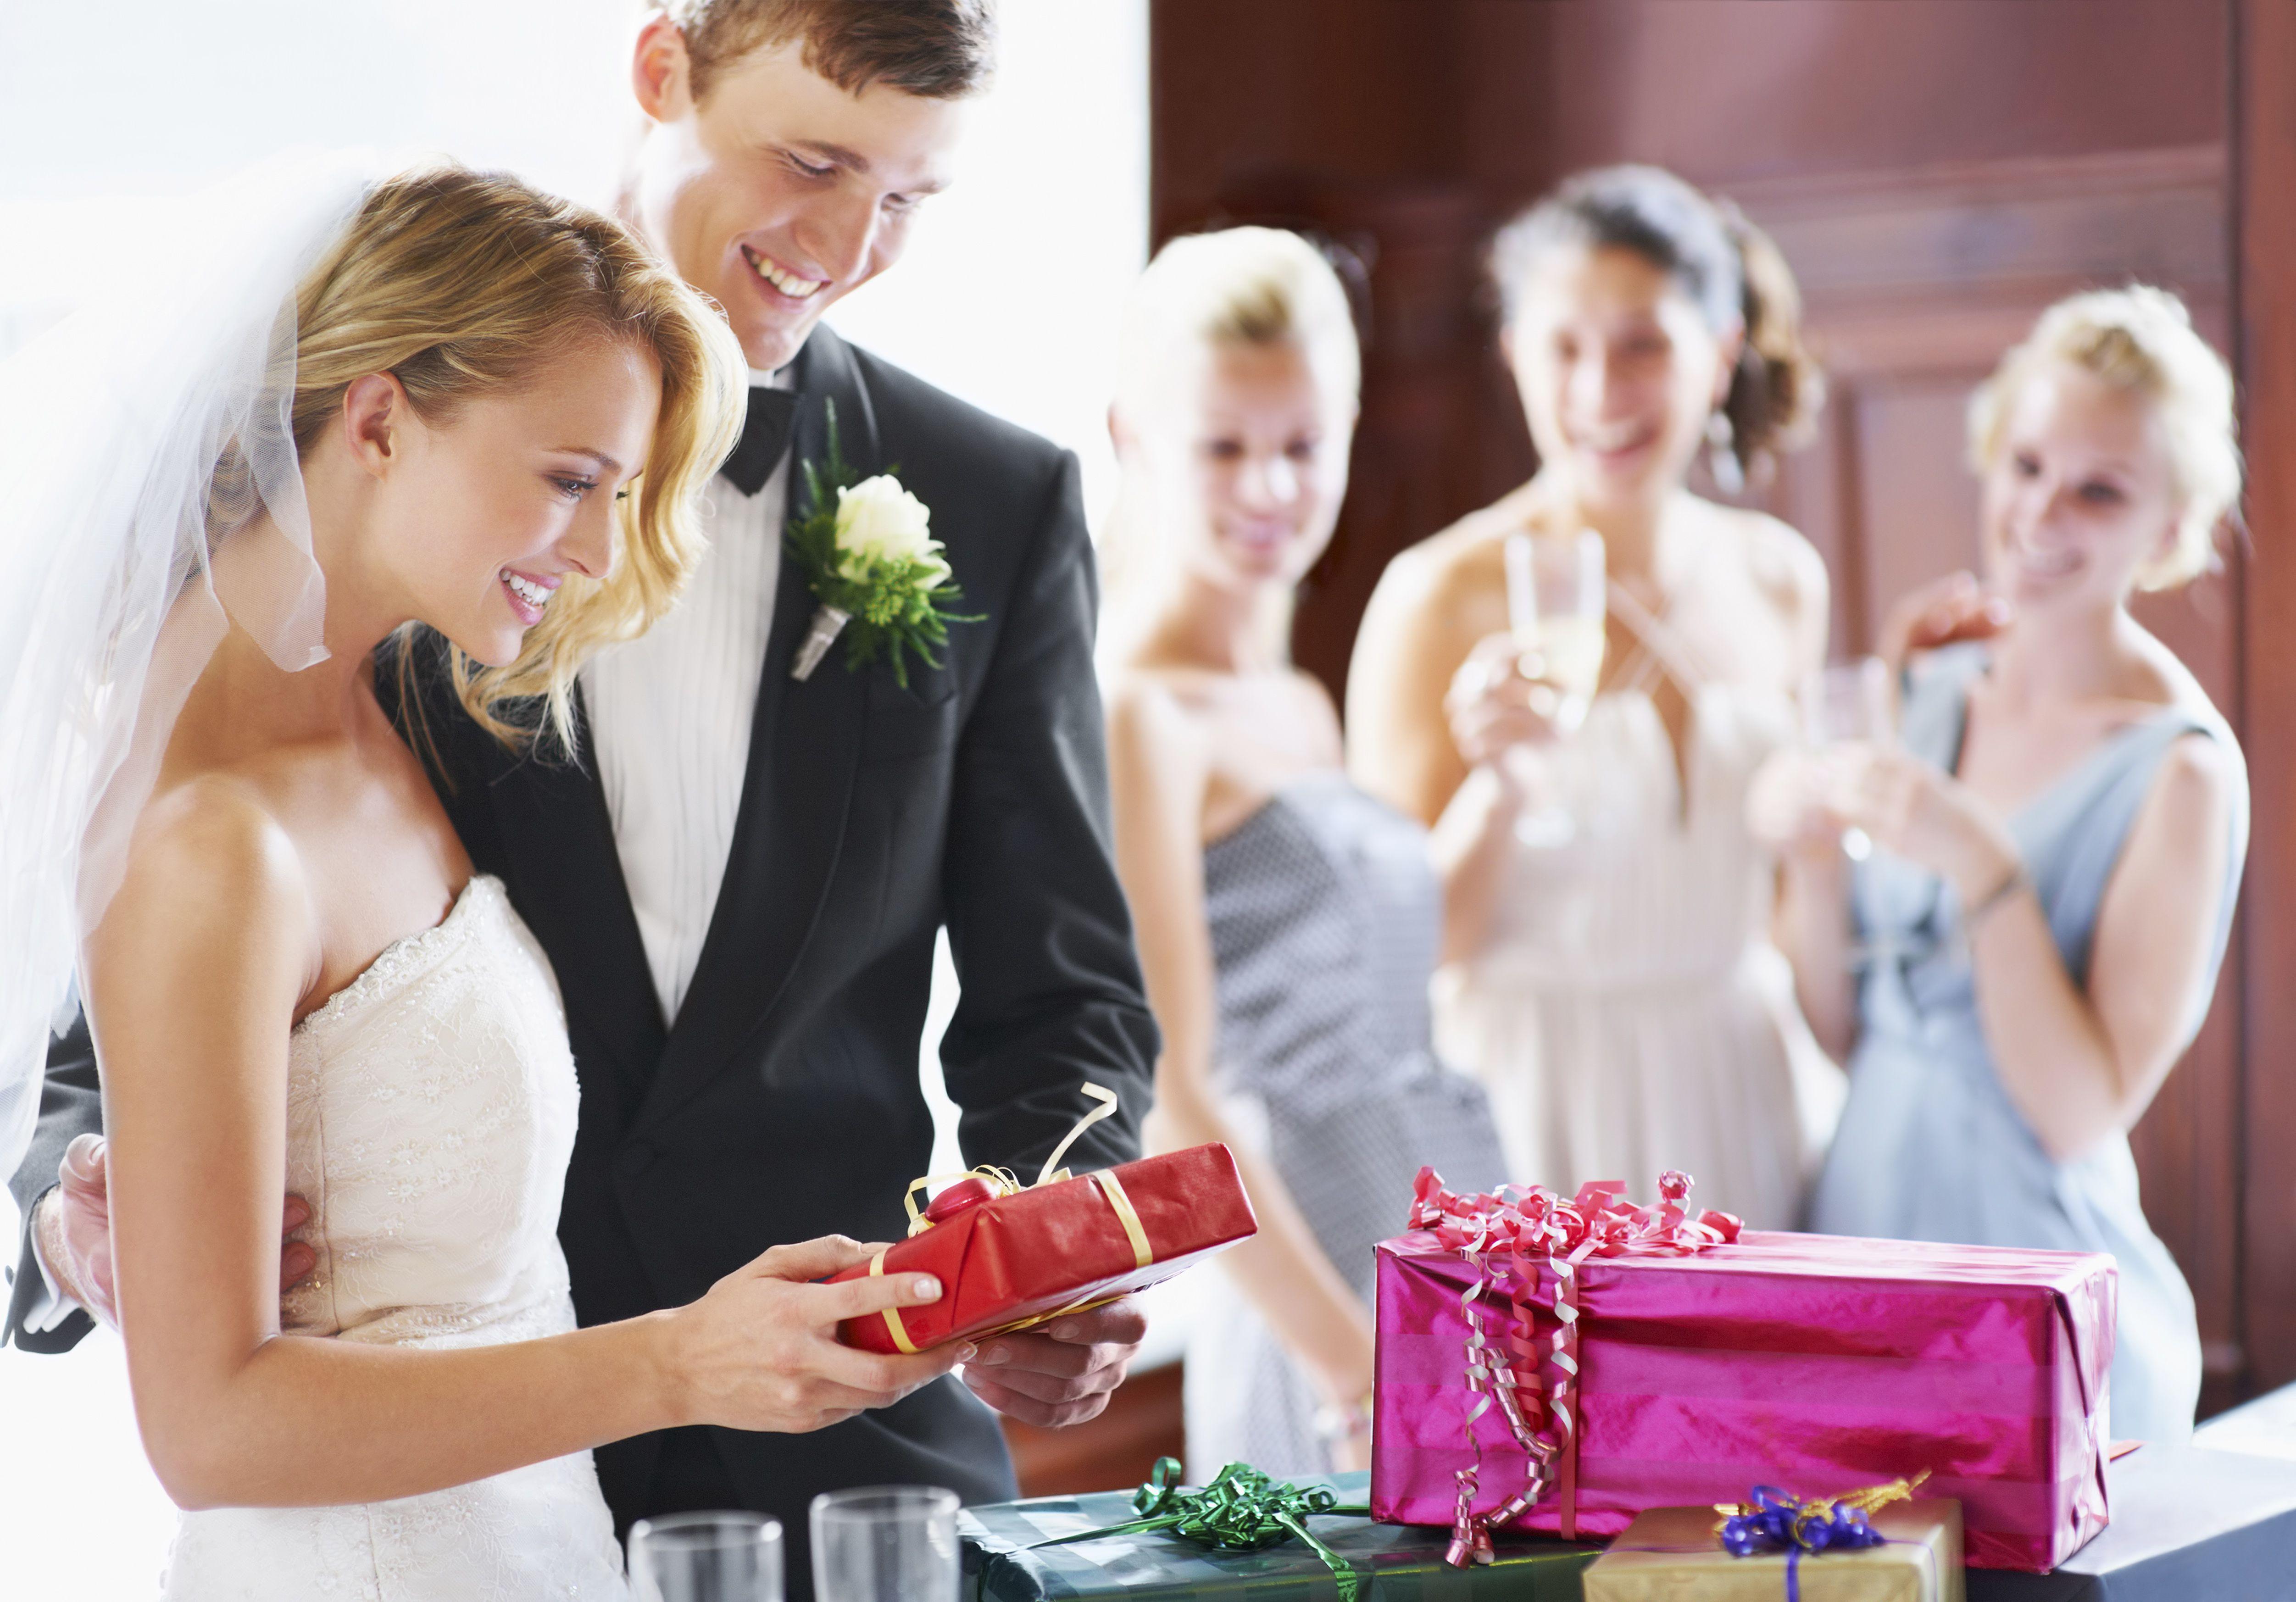 Free Wedding Registry Gifts And Bonuses